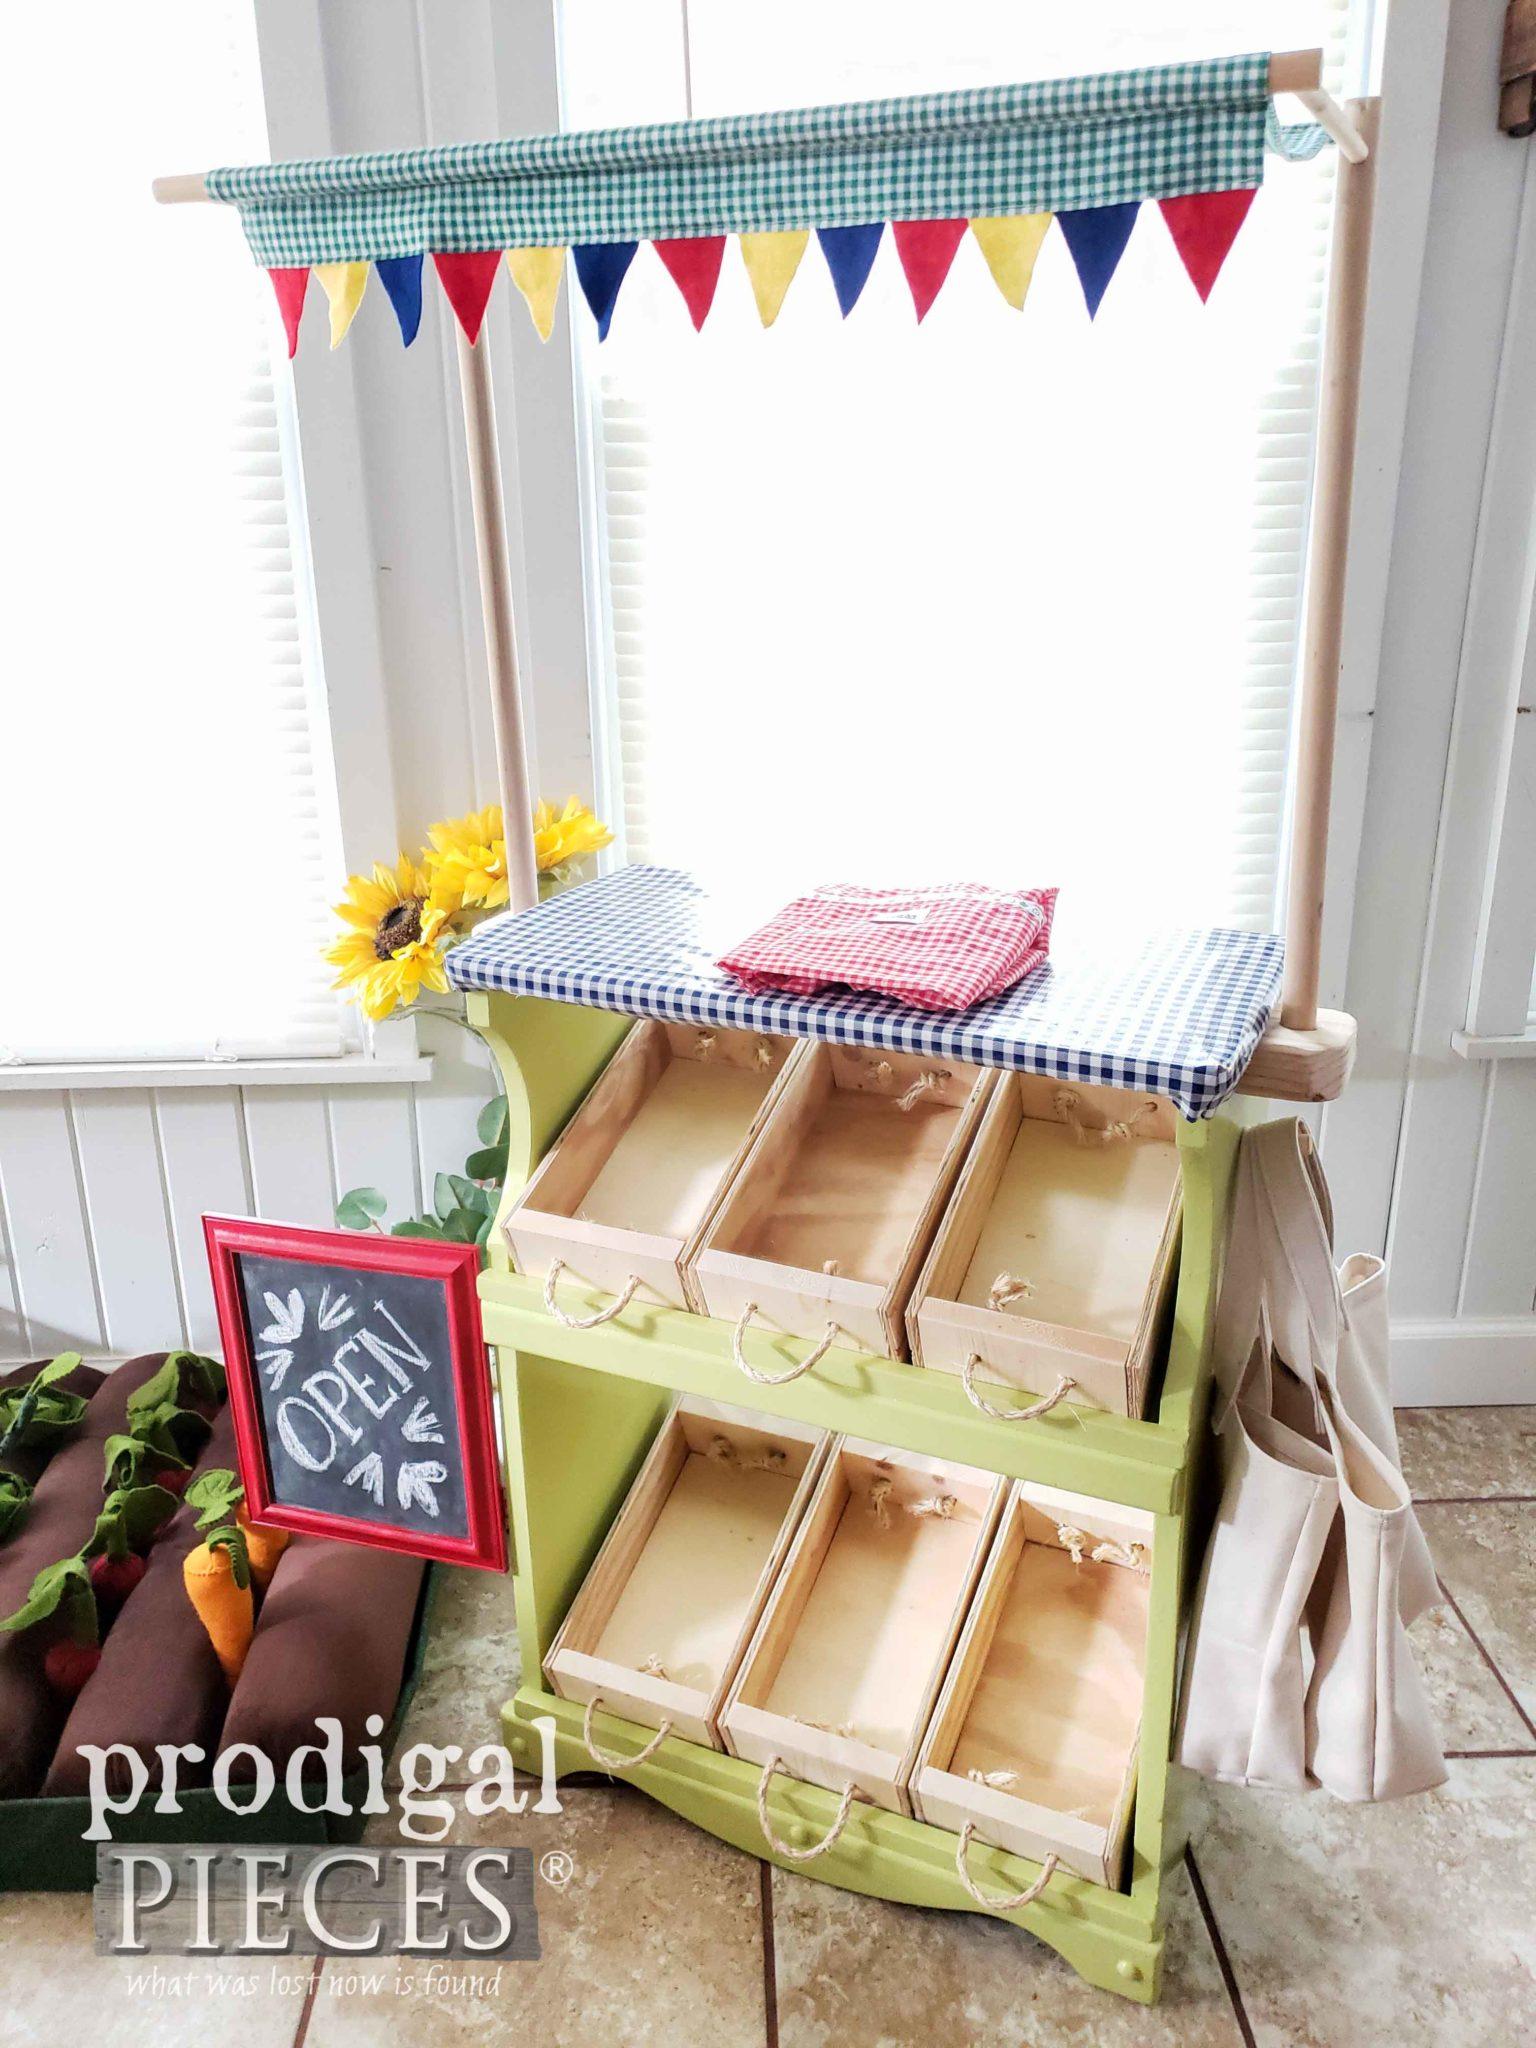 Adorable Handmade Kids Pretend Farmer's Market Created by Larissa of Prodigal Pieces | prodigalpieces.com